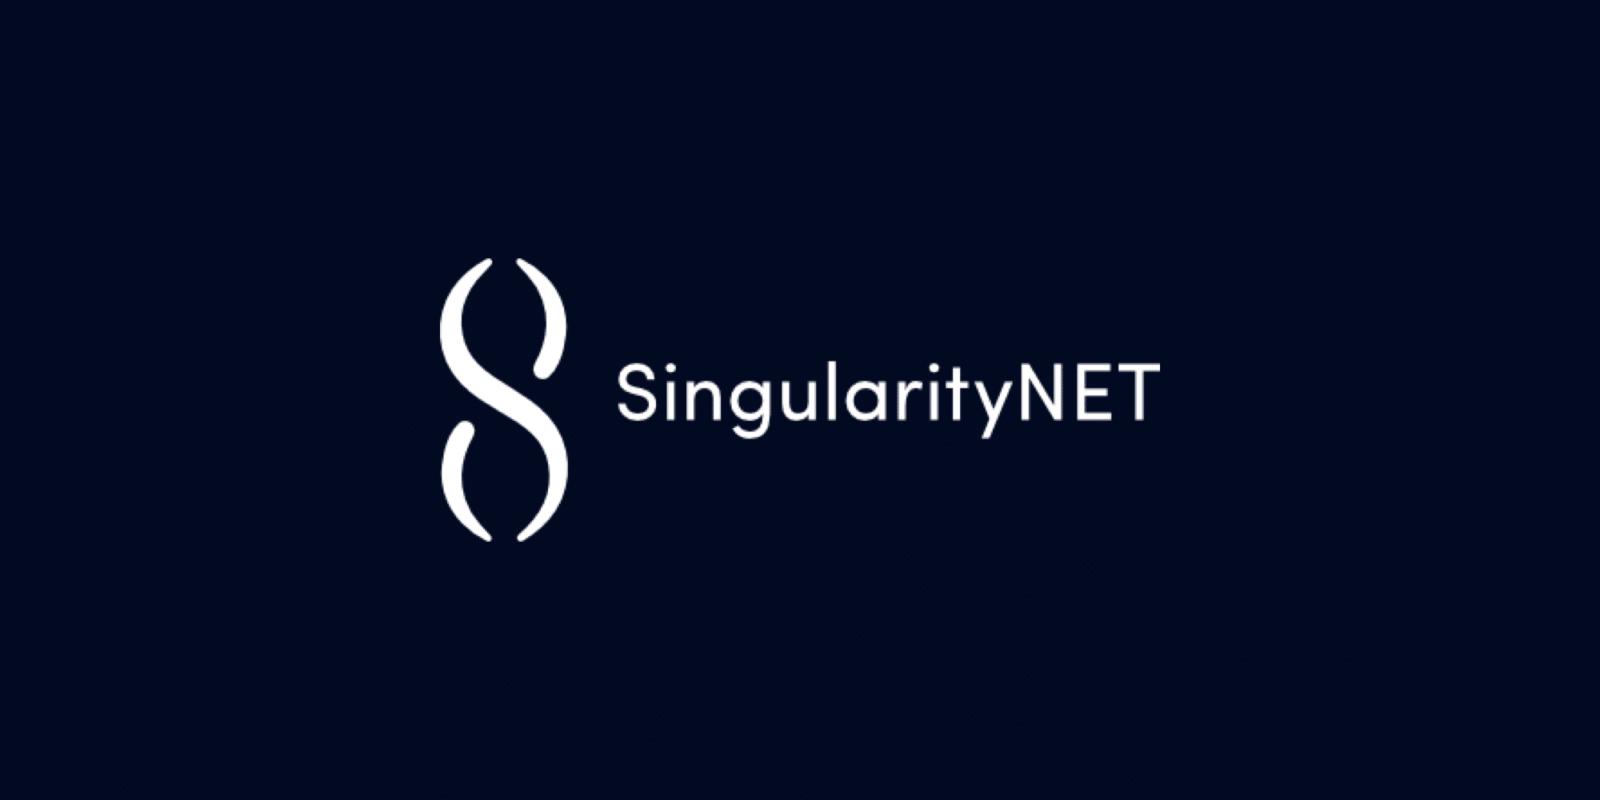 singularitynet криптовалюта